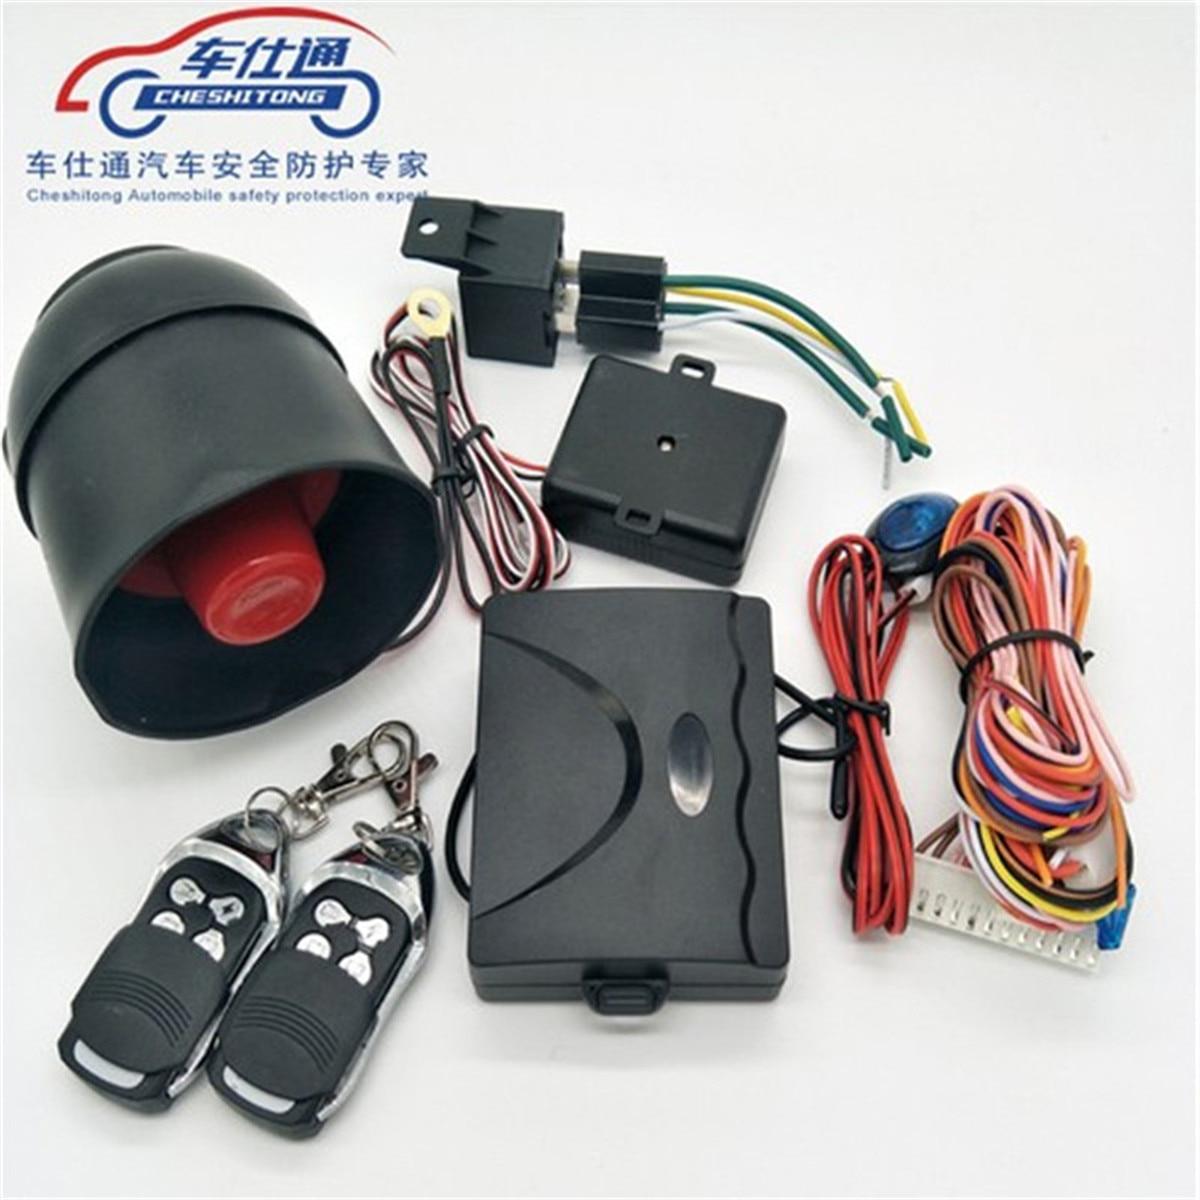 Car Vehicle Burglar Alarm Protection Keyless Security System w// 2 Remote Control